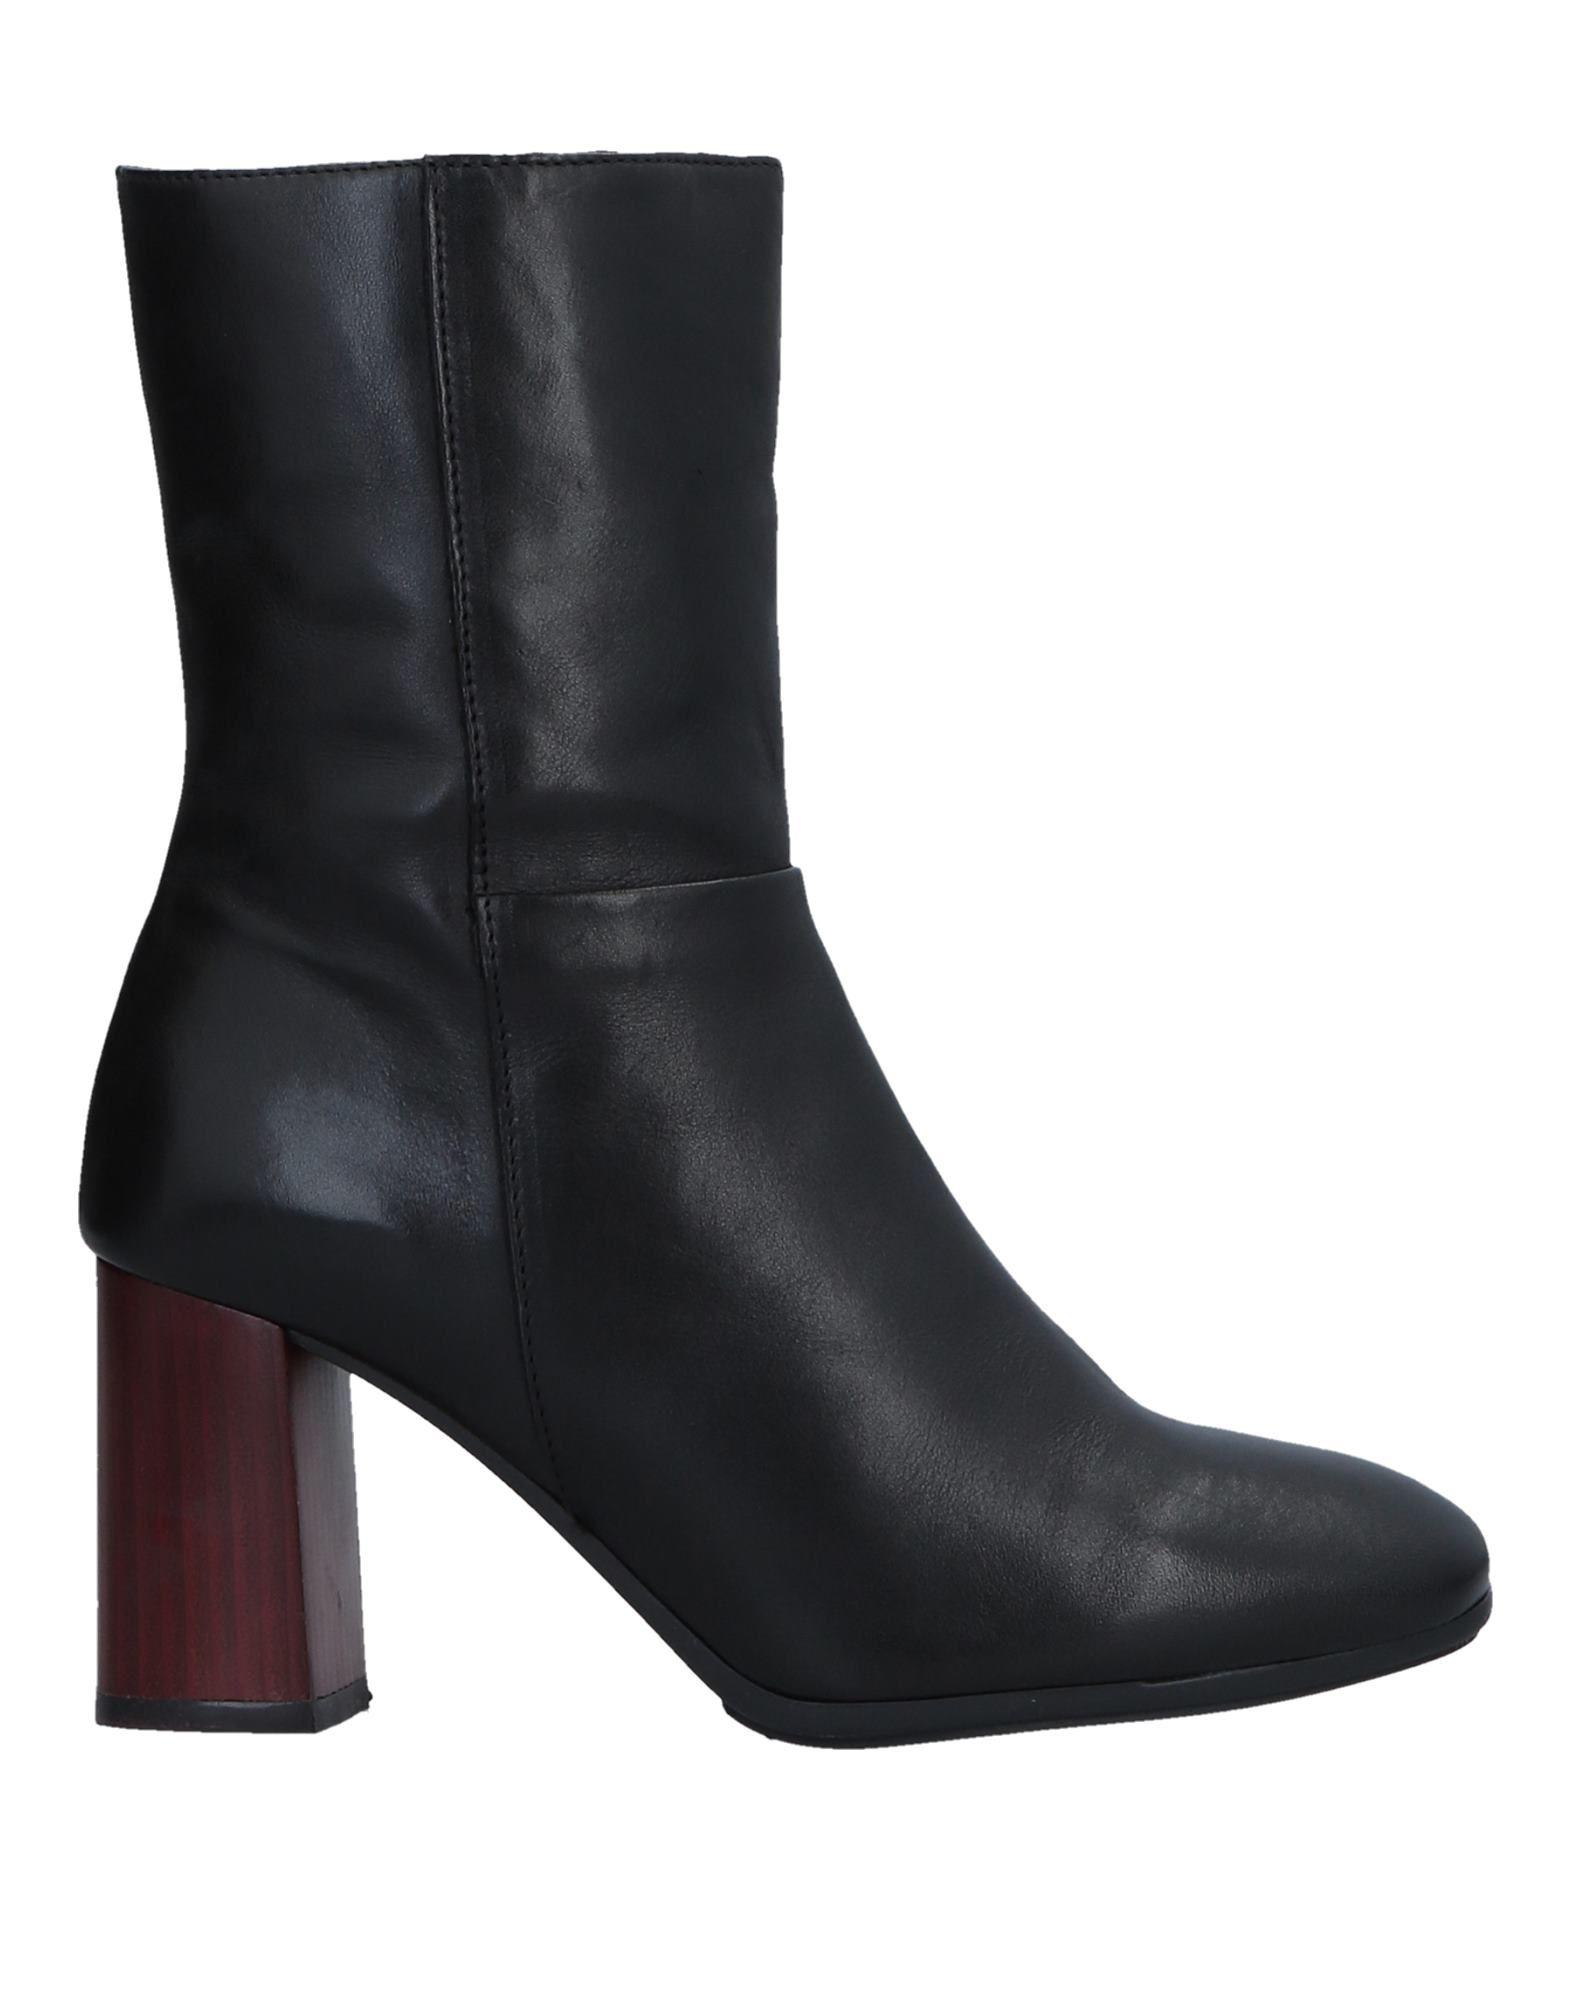 Alpe Woman Shoes Stiefelette Damen  11526738VL Gute Qualität beliebte Schuhe